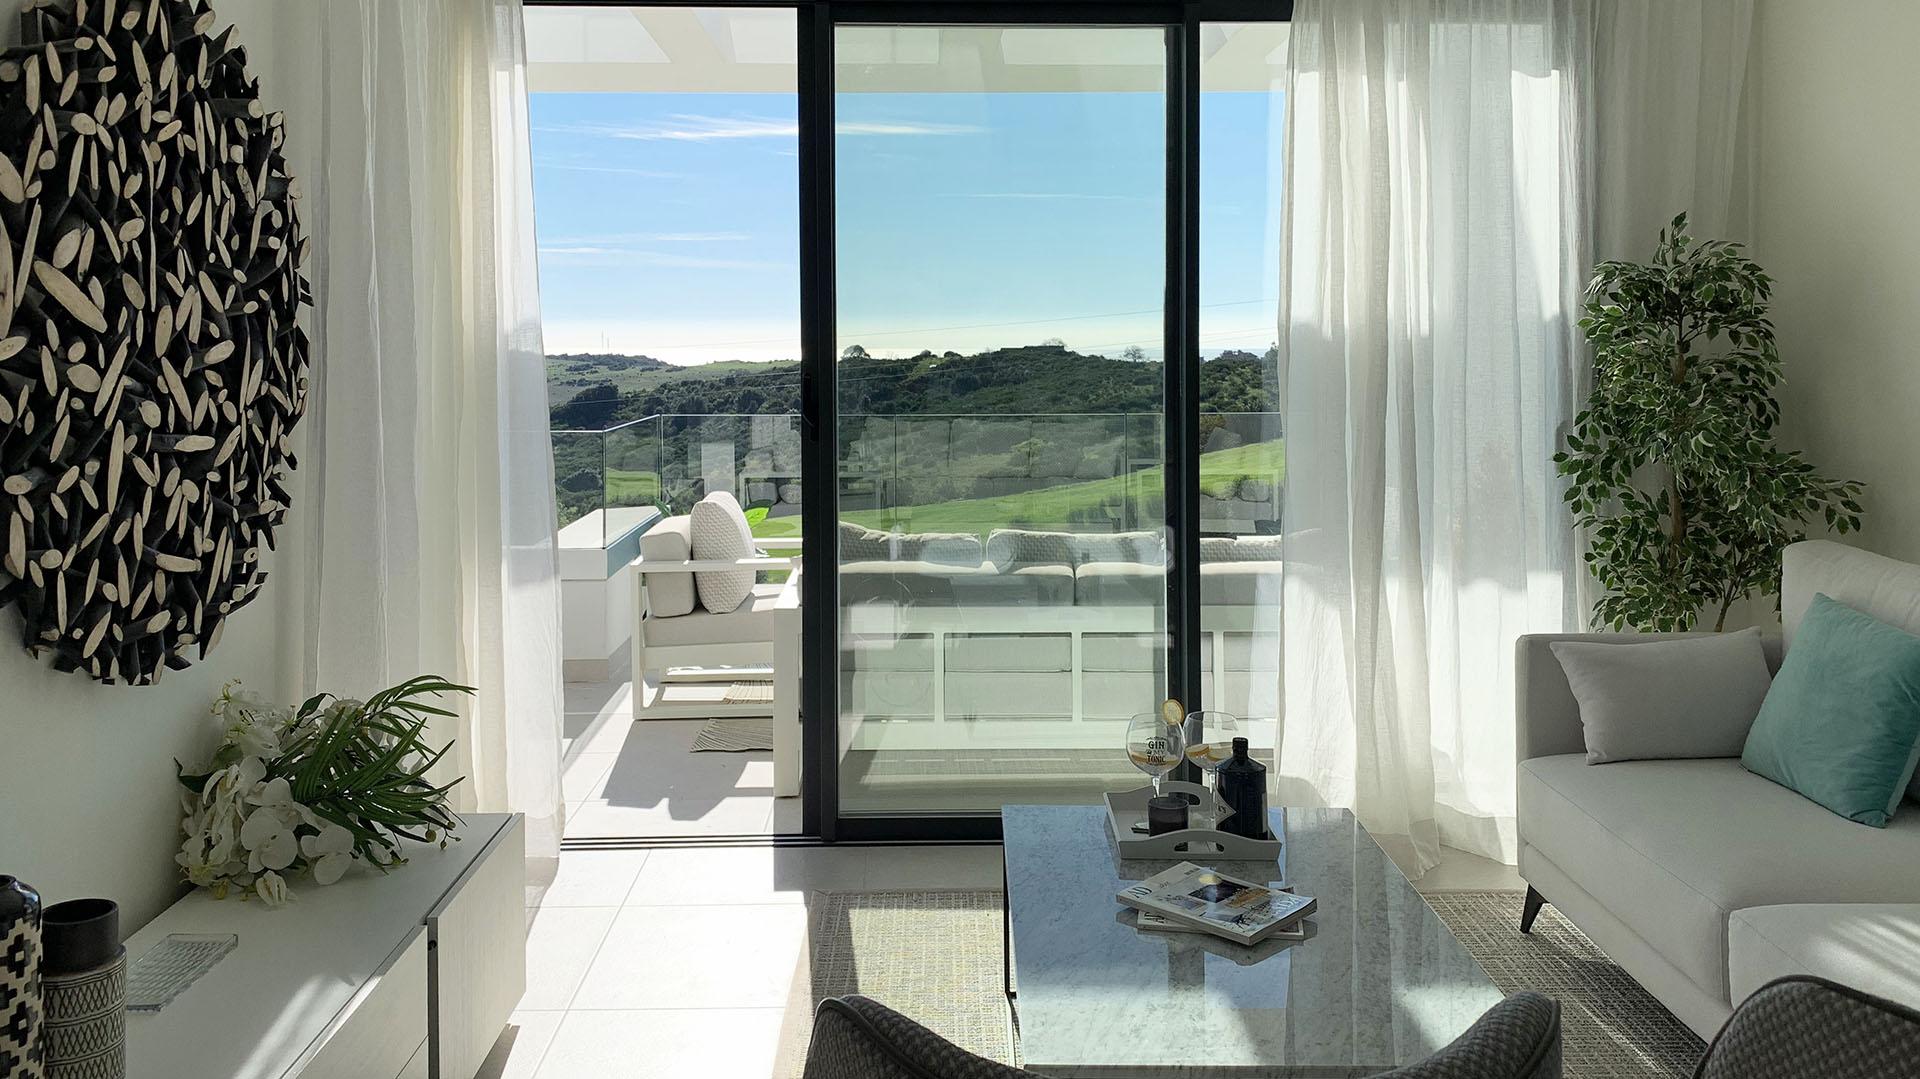 Mirador del Golf: Apartments in Estepona with stunning views